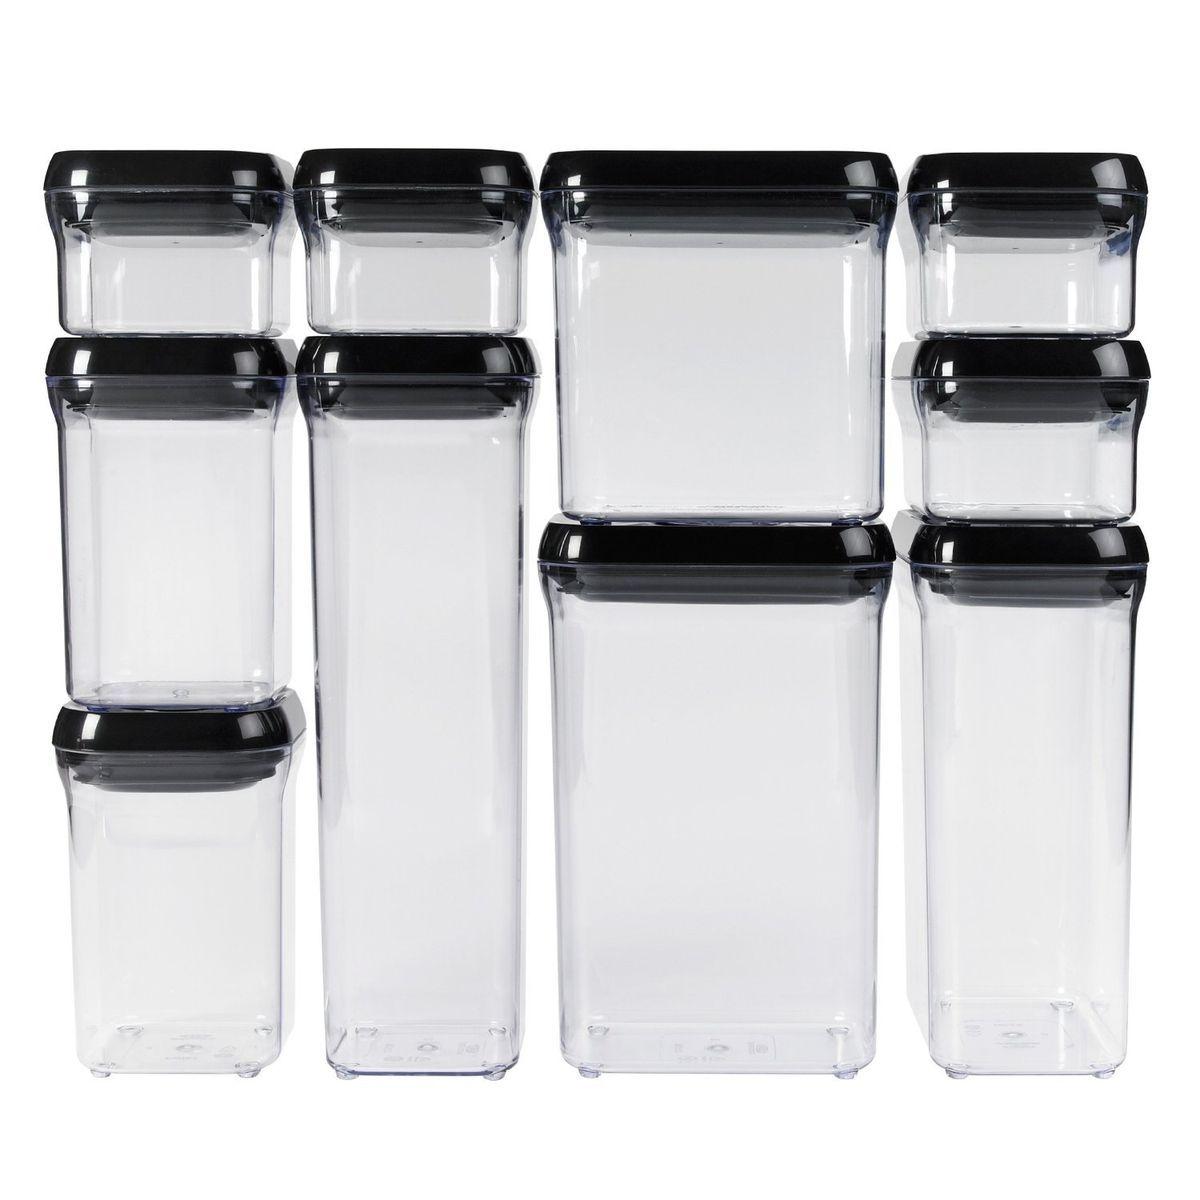 OXO Good Grips 10 Piece Pop Black Food Storage Container Set